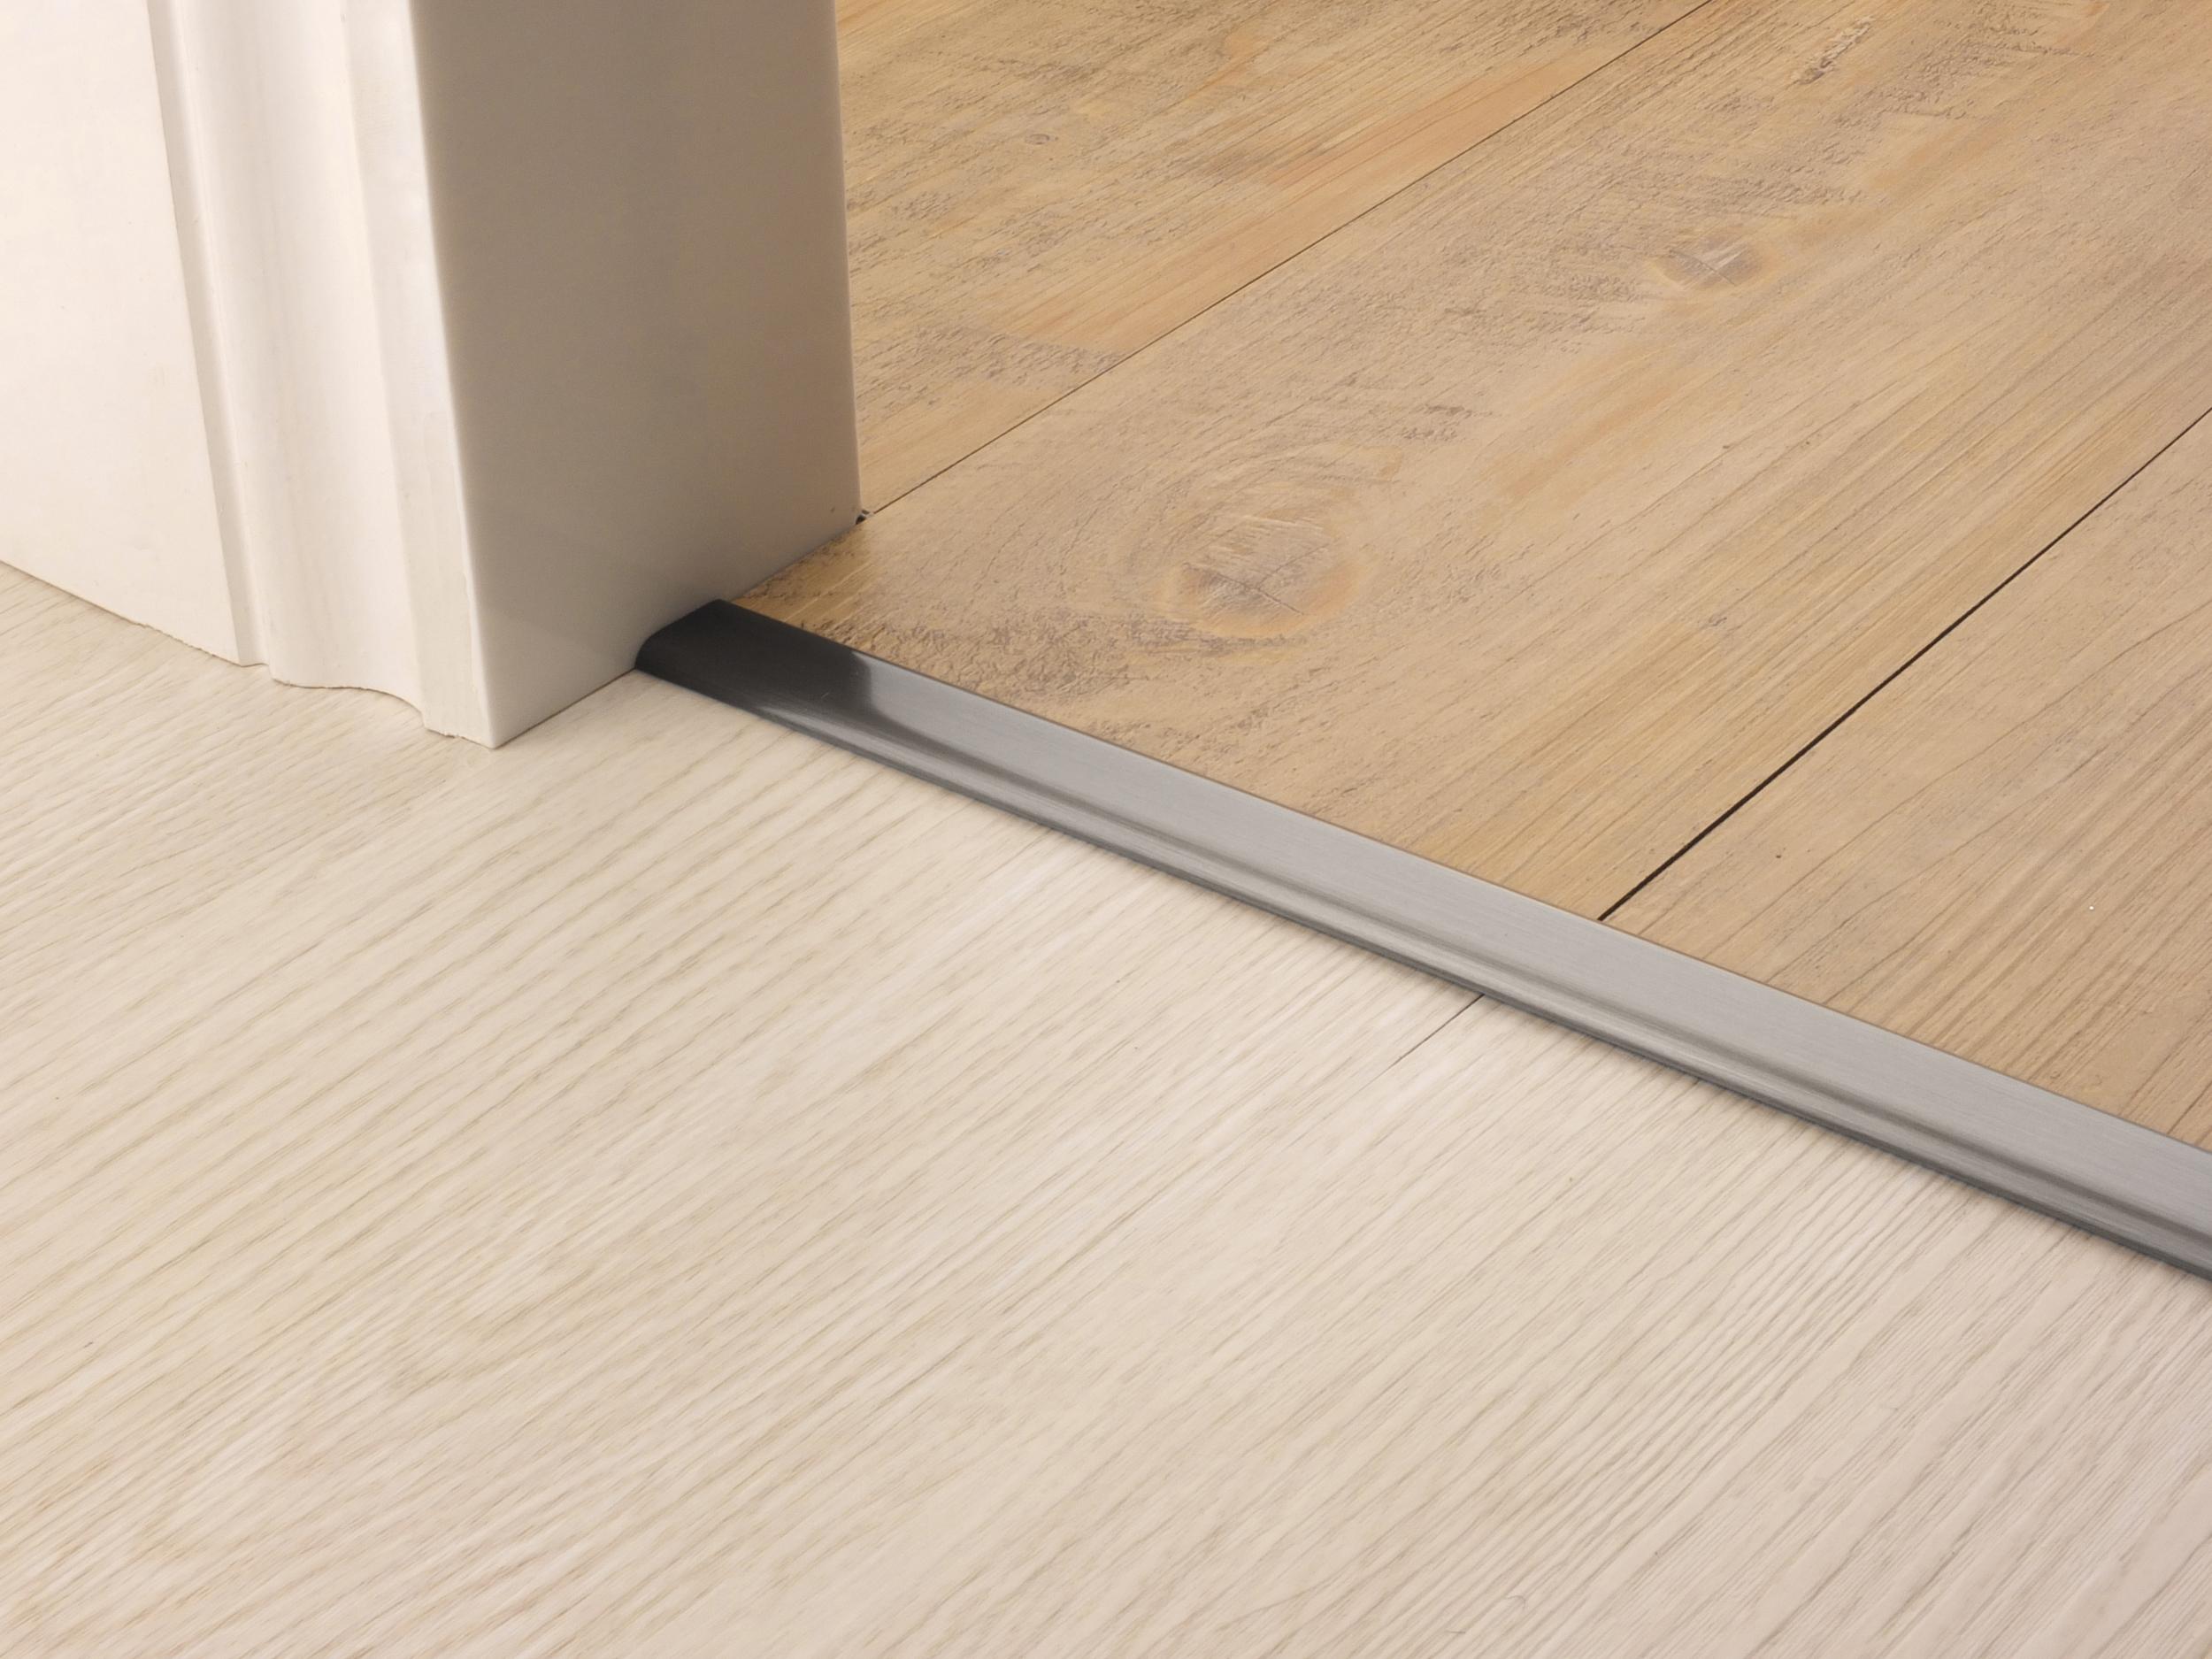 stairrods-doorbar-vinyl-edge-pewter.jpg